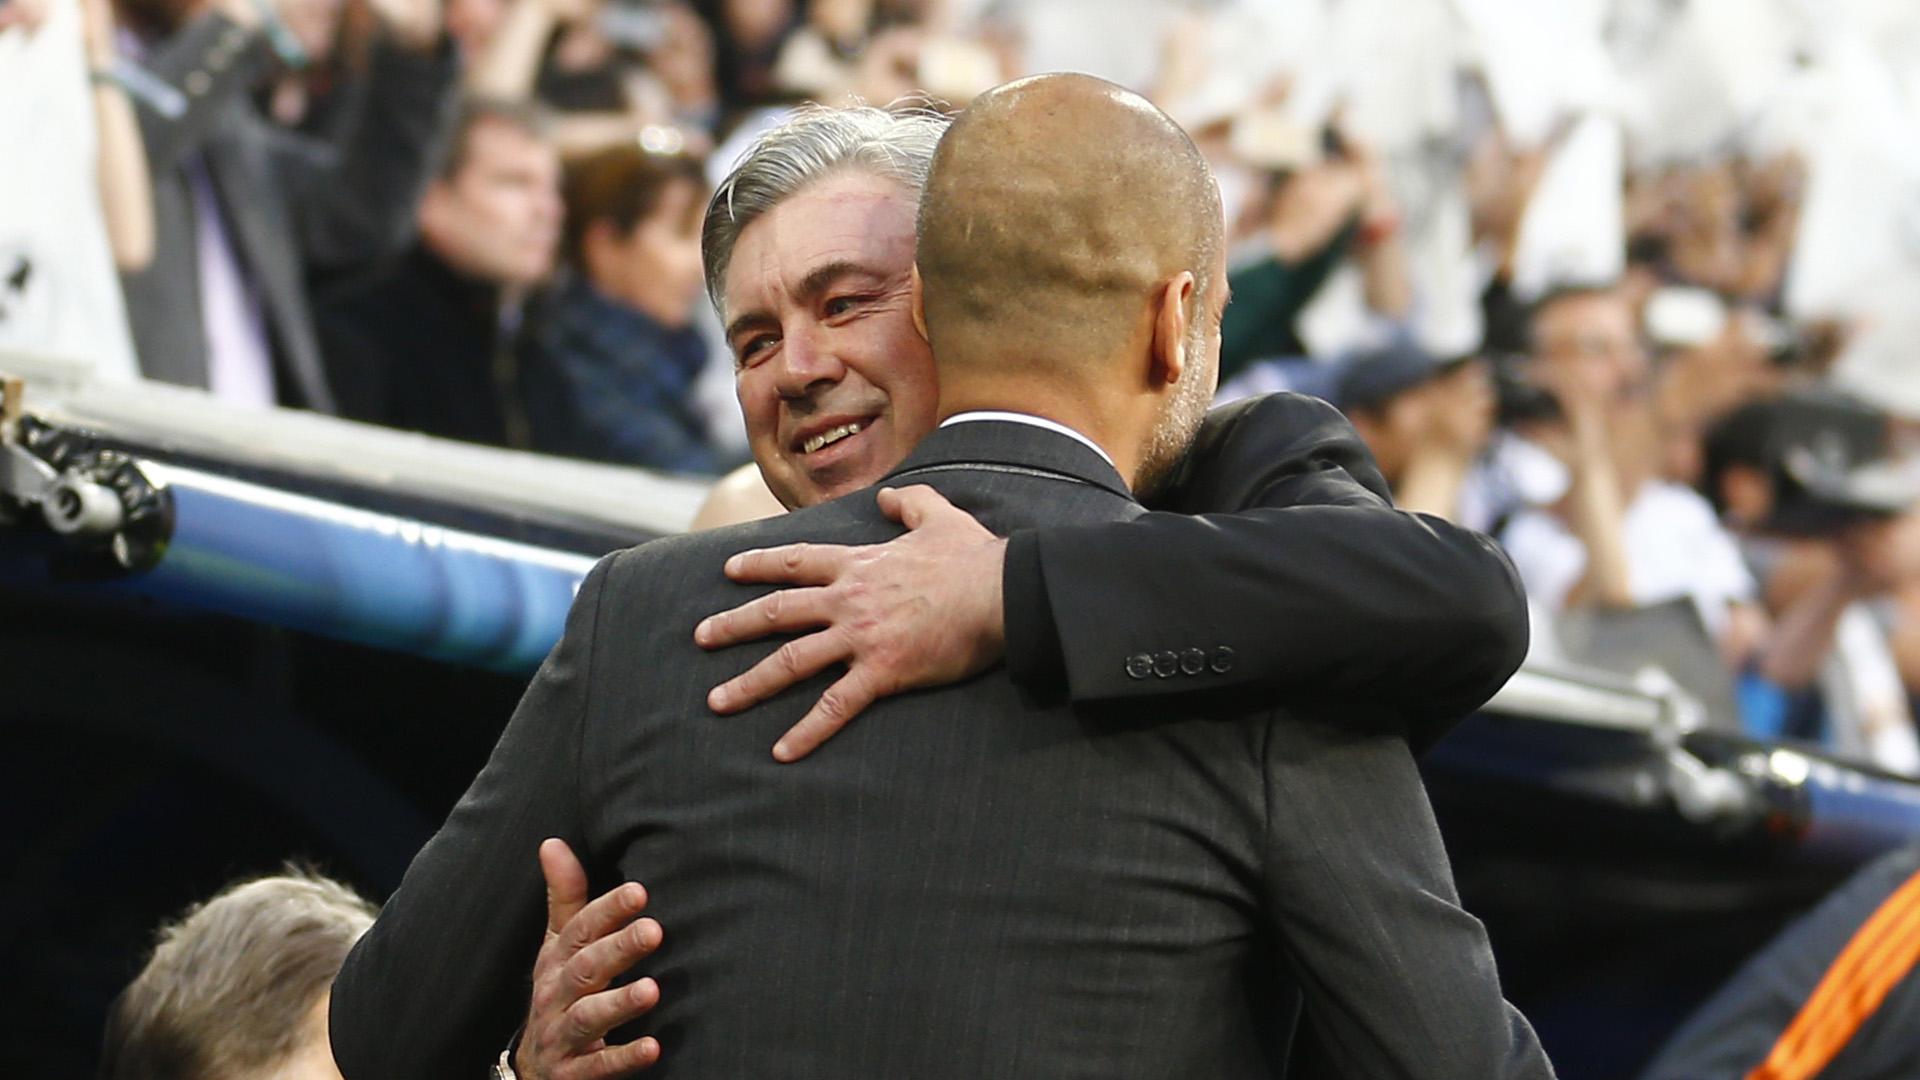 Carlos-Ancelotti-Pep-Guardiola-FTR-042314.jpg